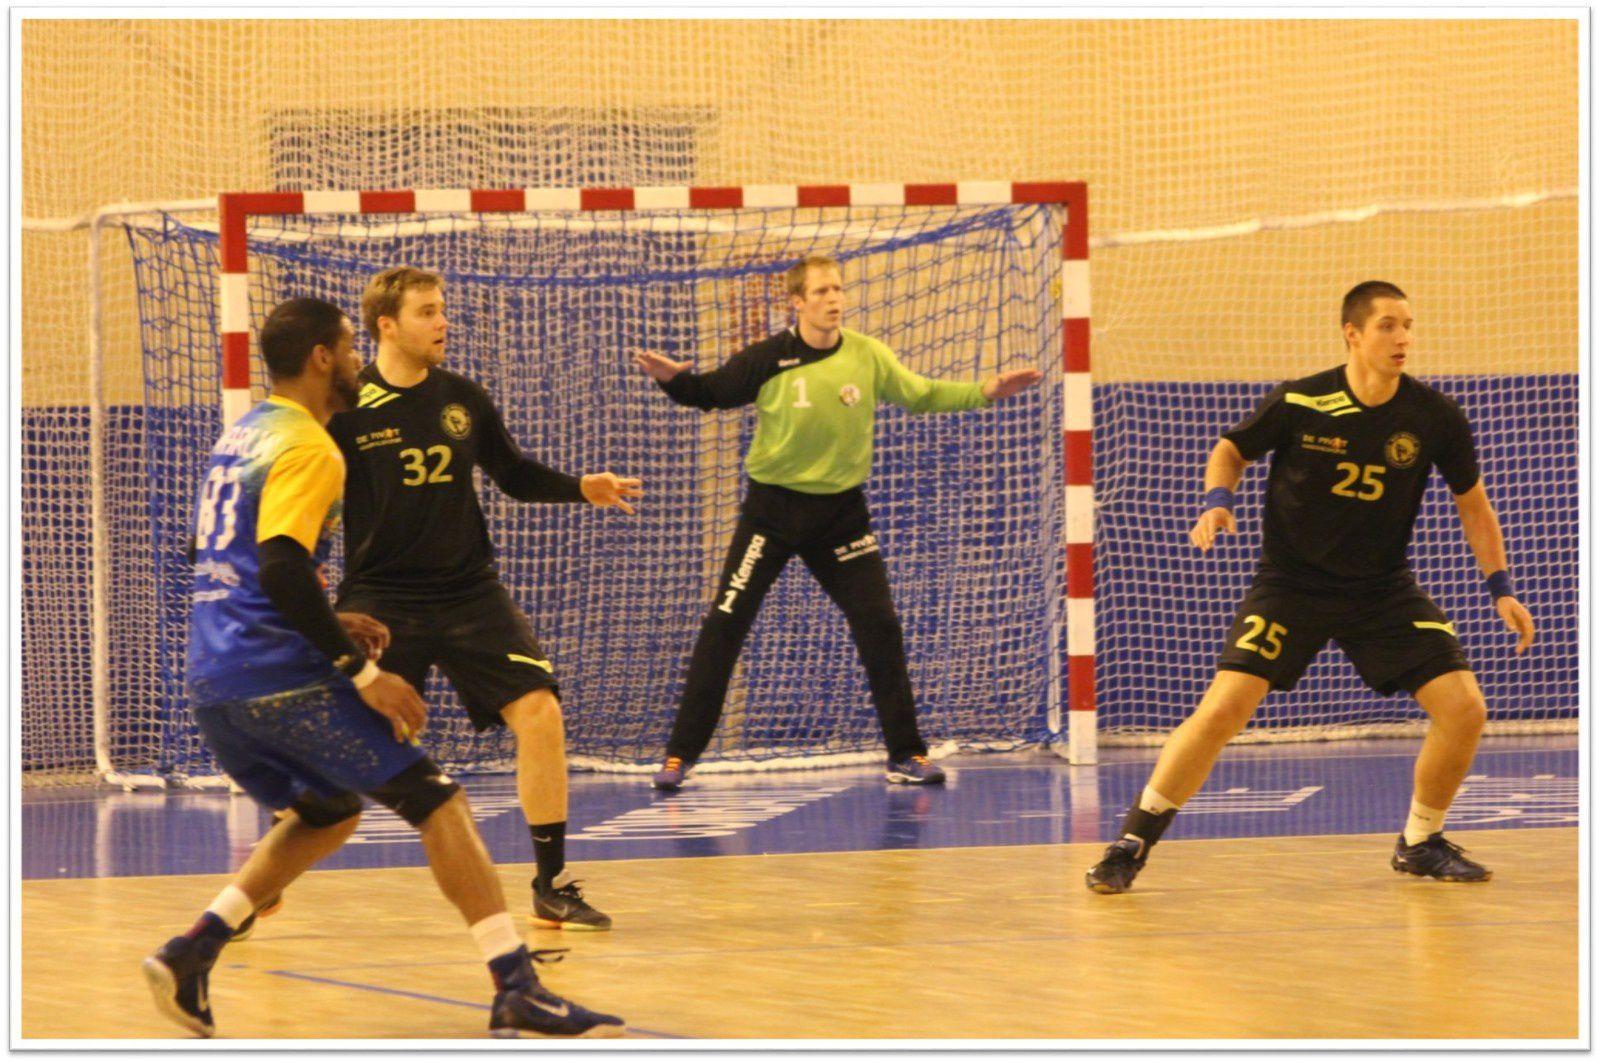 Pontault-Combault vs Belgique (Amical 03.04.2015)